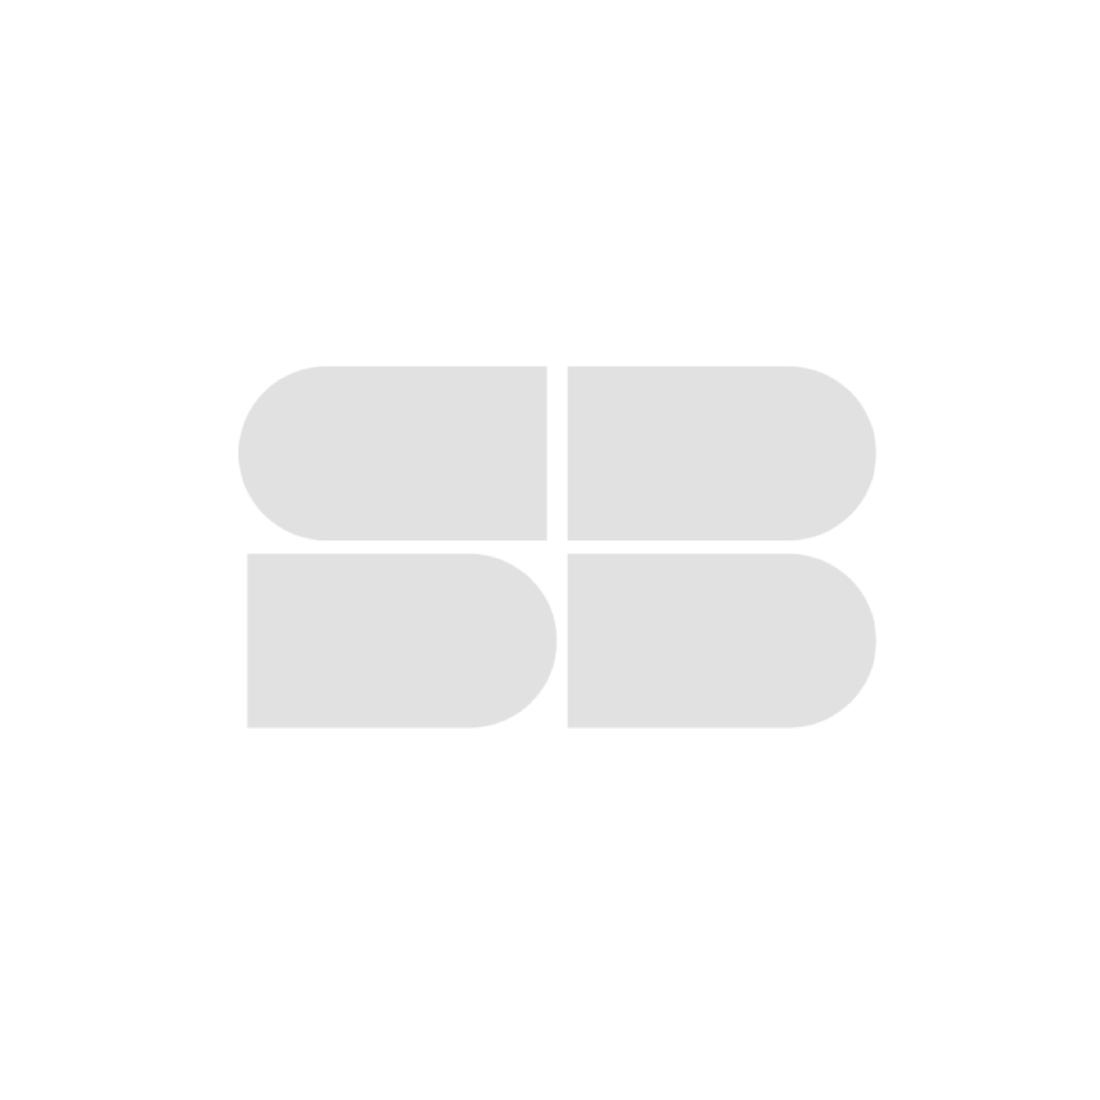 Nano alternative leather sofa 2 ที่นั่ง Kitzo ครีม